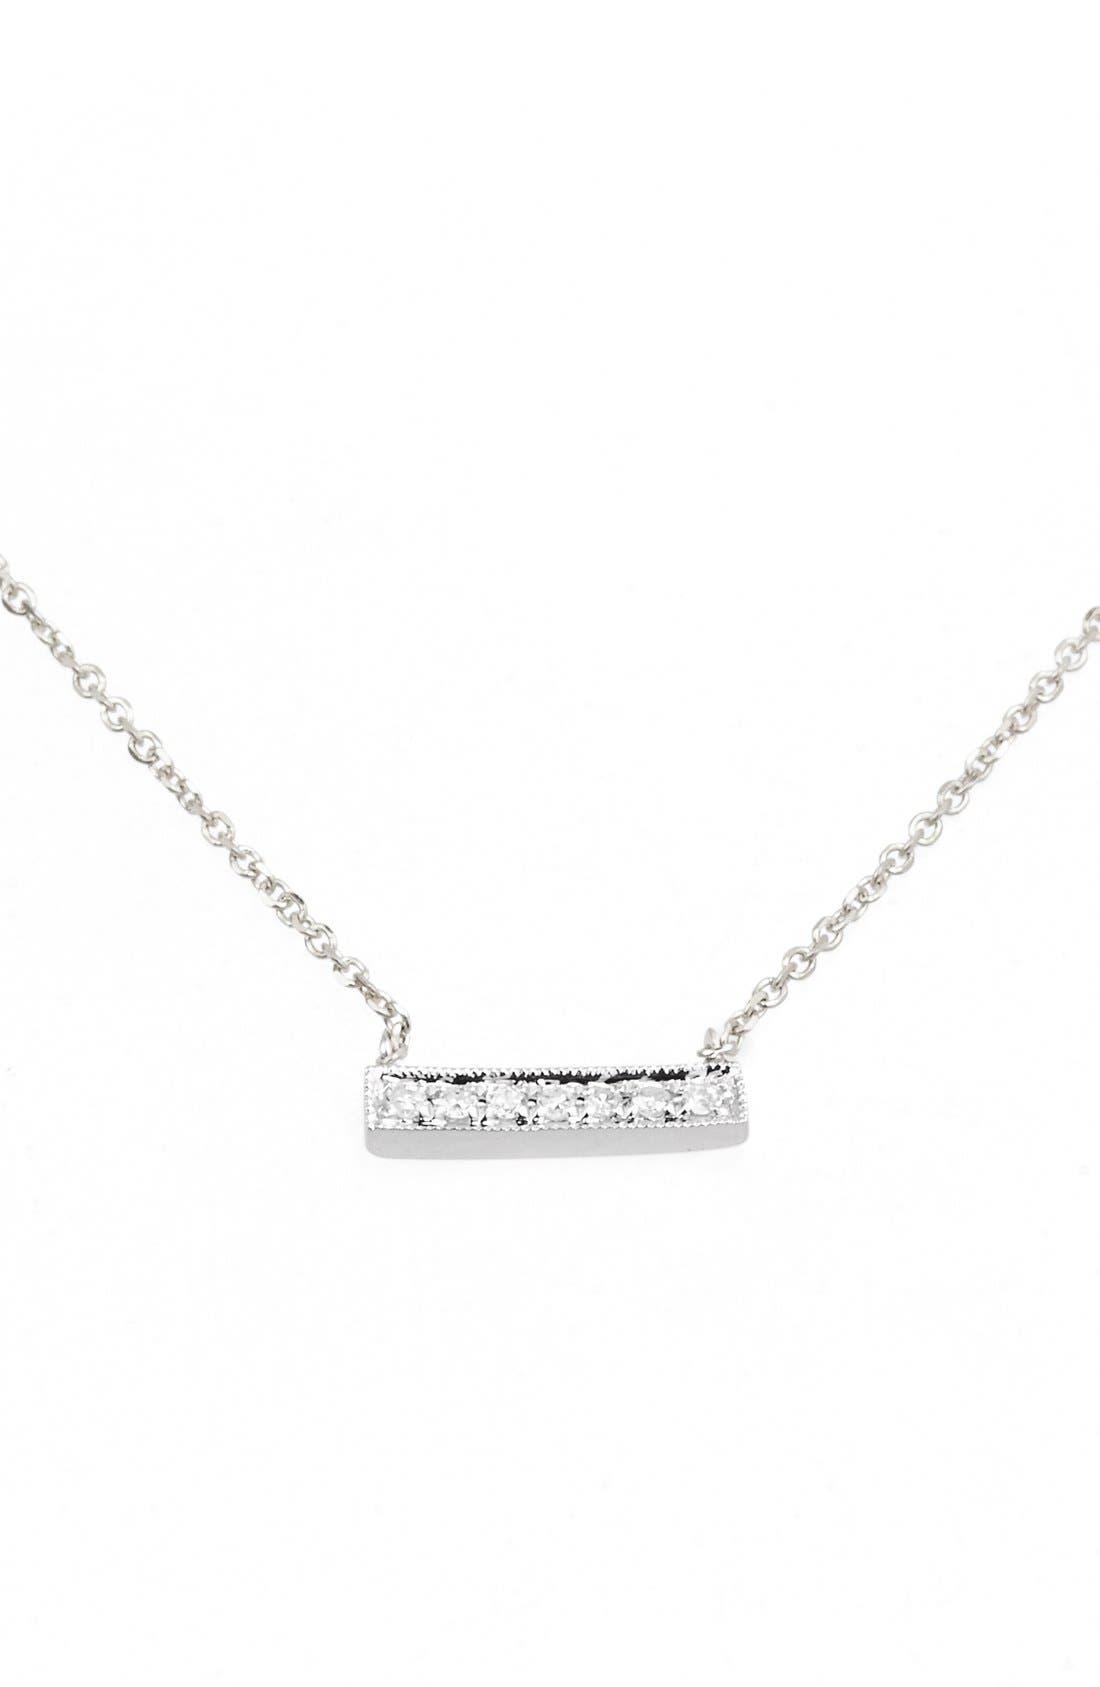 Dana Rebecca Designs 'Sylvie Rose' Diamond Bar Pendant Necklace